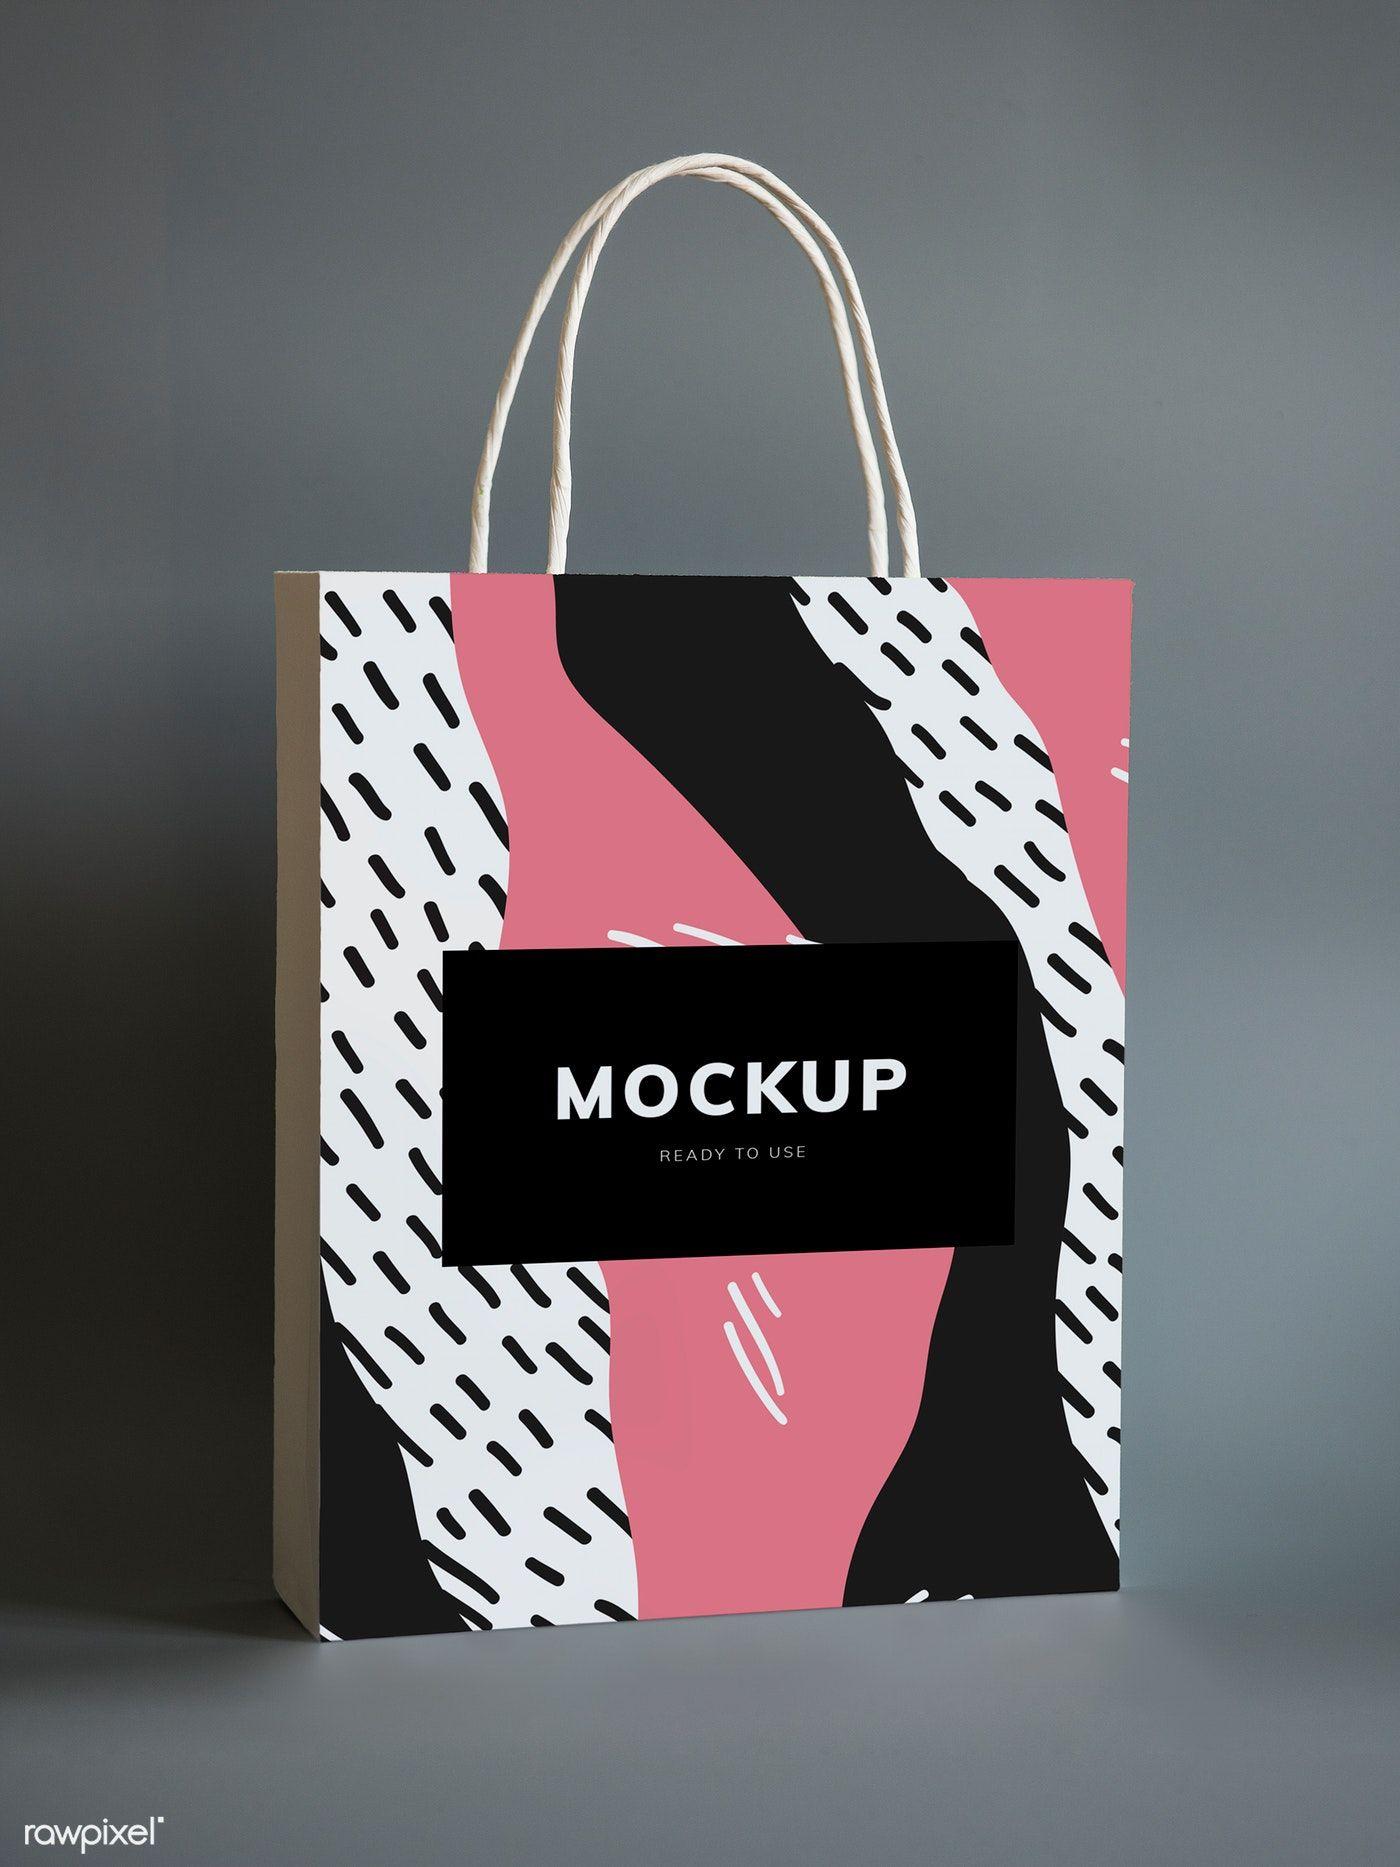 Download Download Premium Psd Of Colorful Shopping Paper Bag Mockup 502726 Bag Mockup Paper Bag Packaging Design Inspiration